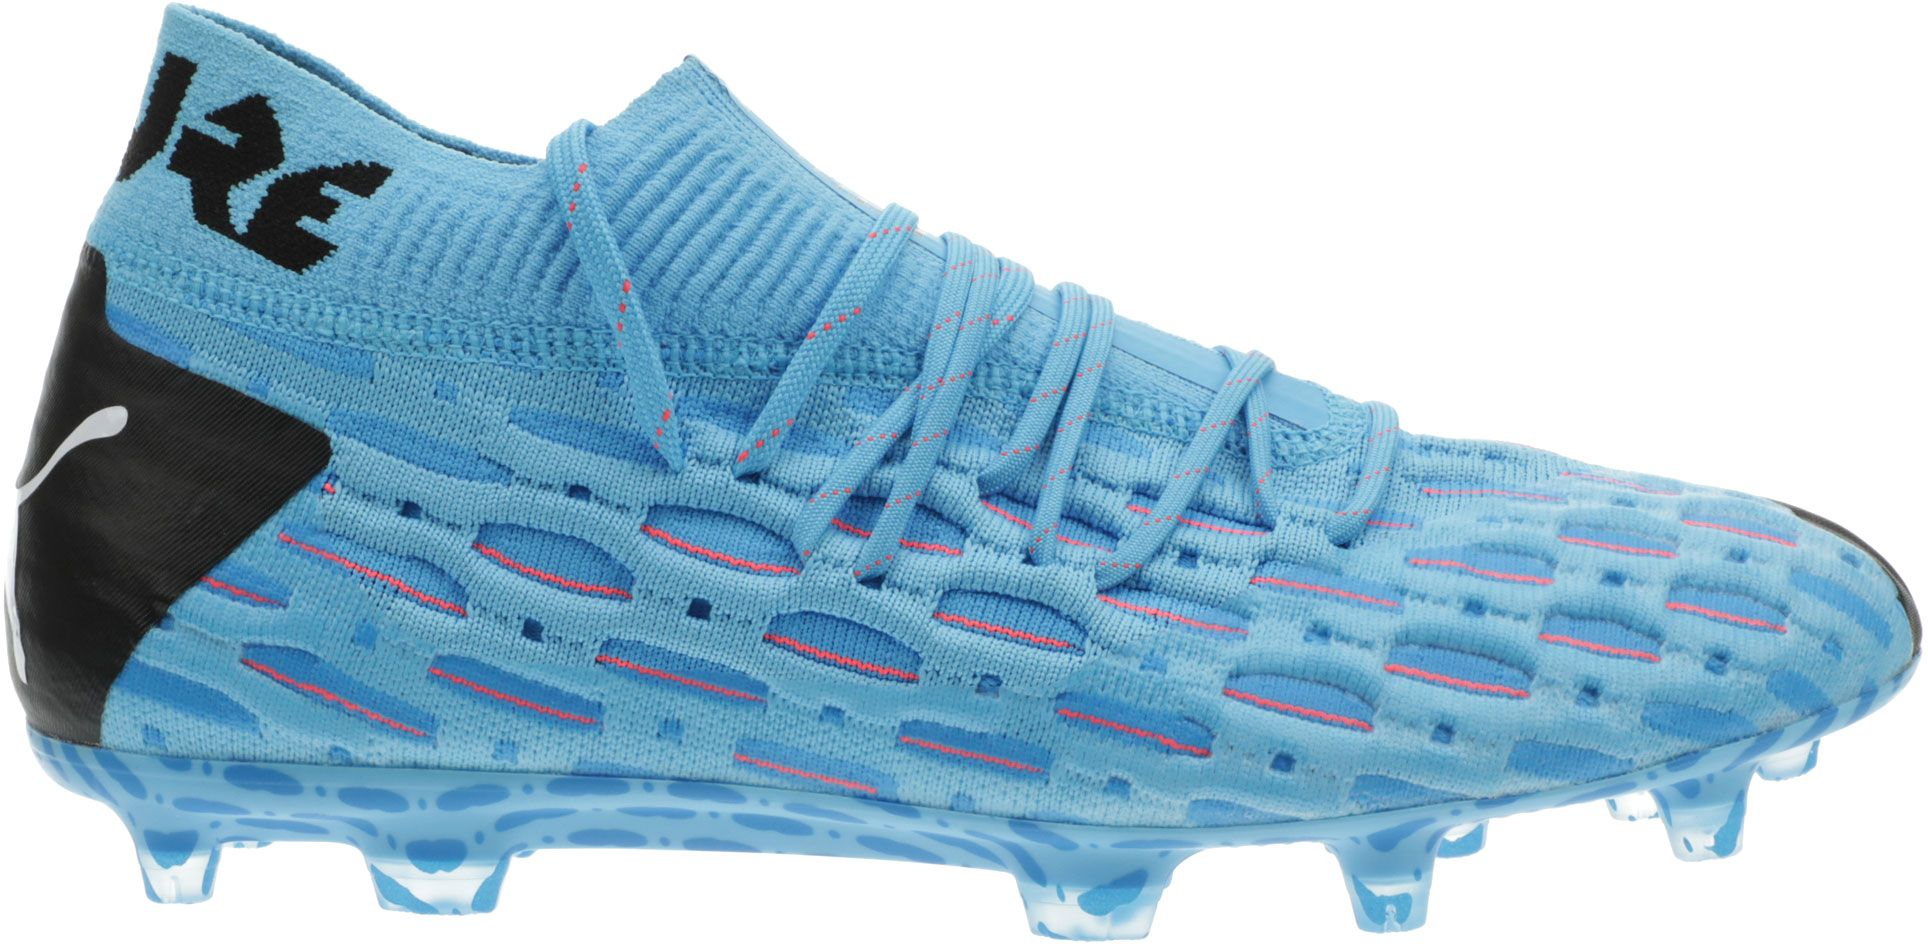 PUMA Men's Future 5.1 NetFit FG Soccer Cleats, Size: Small, Blue